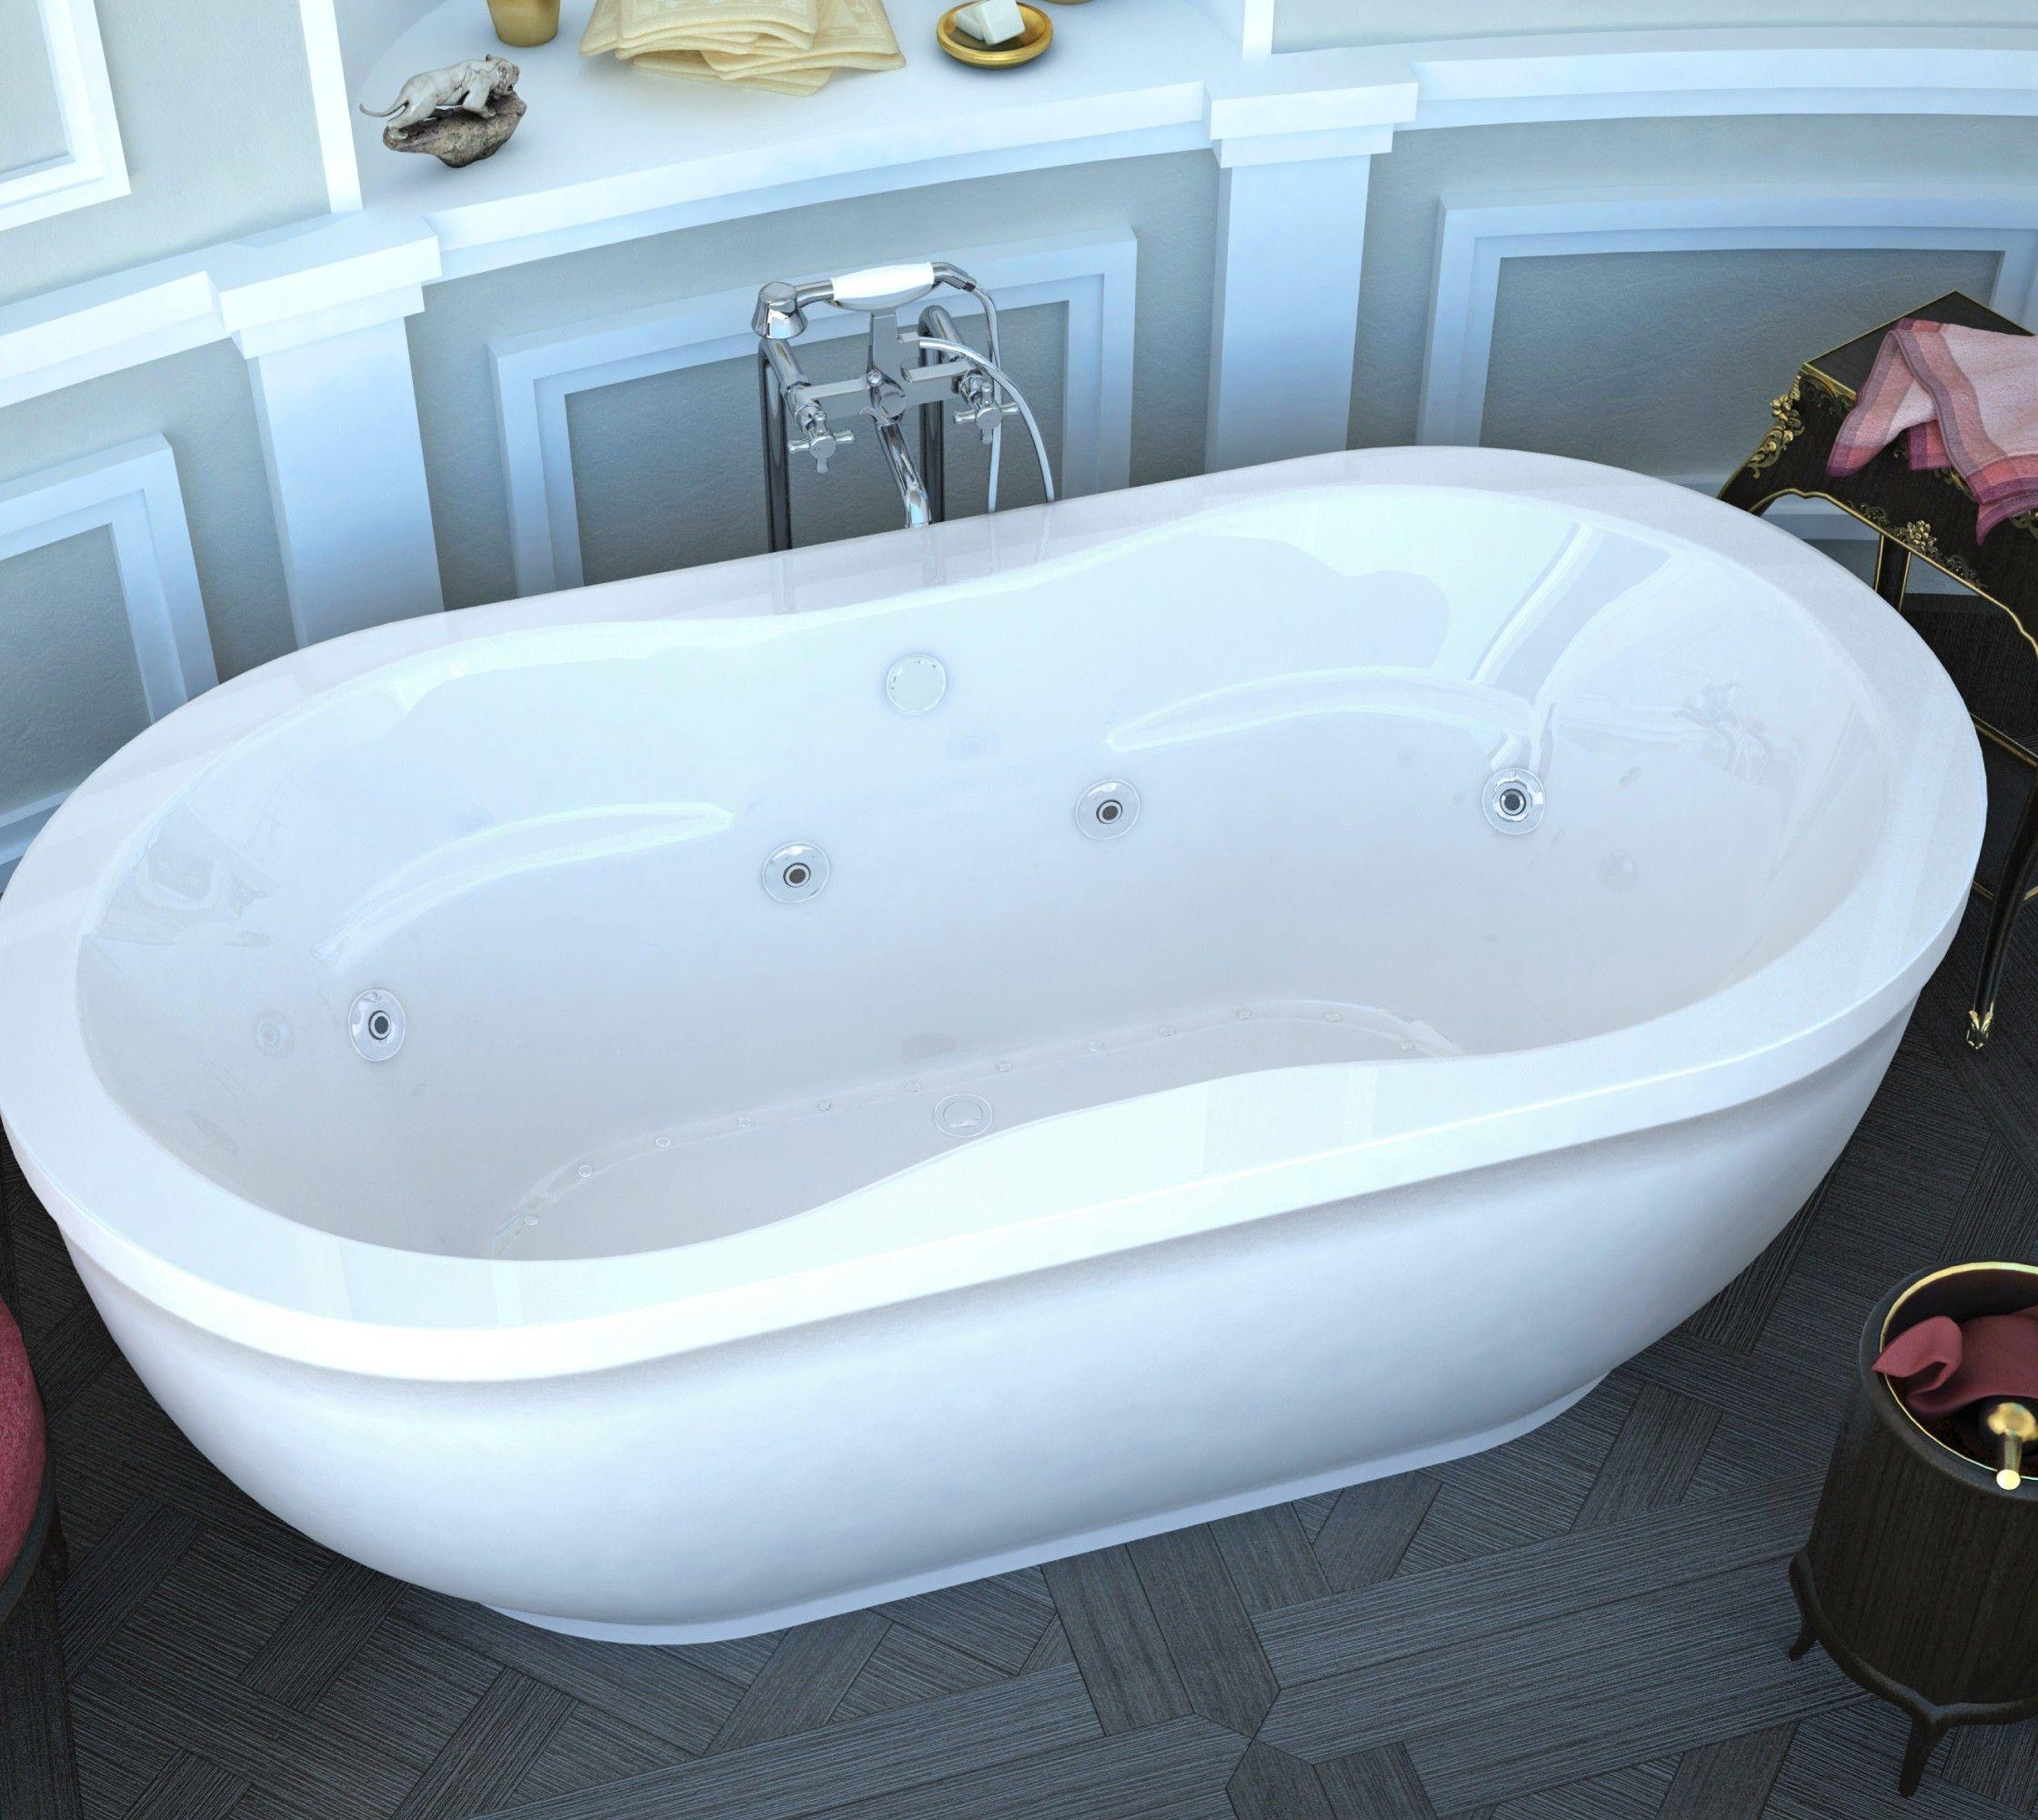 Monet 34x71 In Freestanding Air Whirlpool Jetted Bathtub